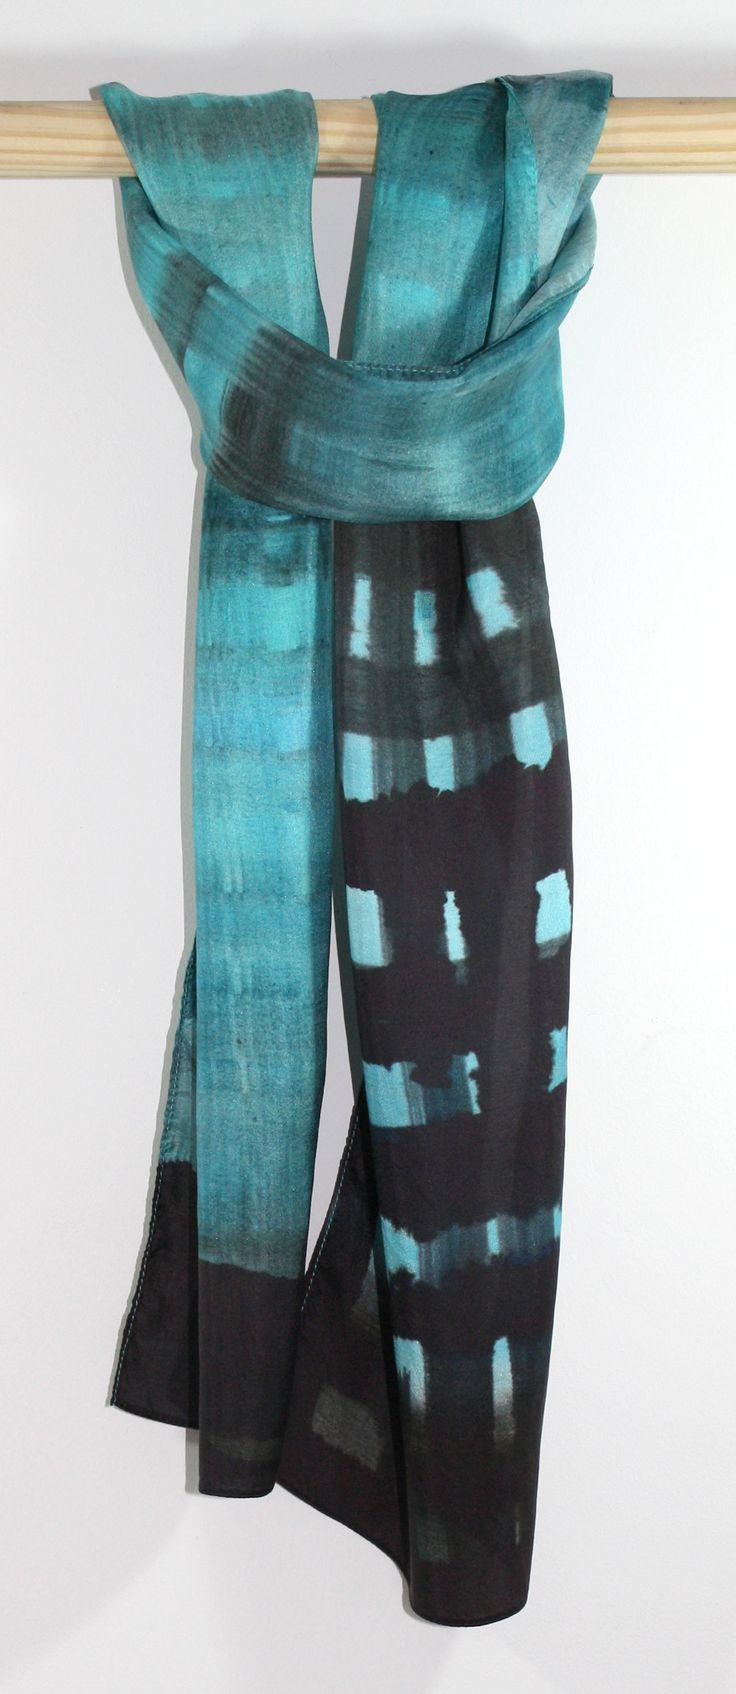 Paint Photo silk scarf, £45.00